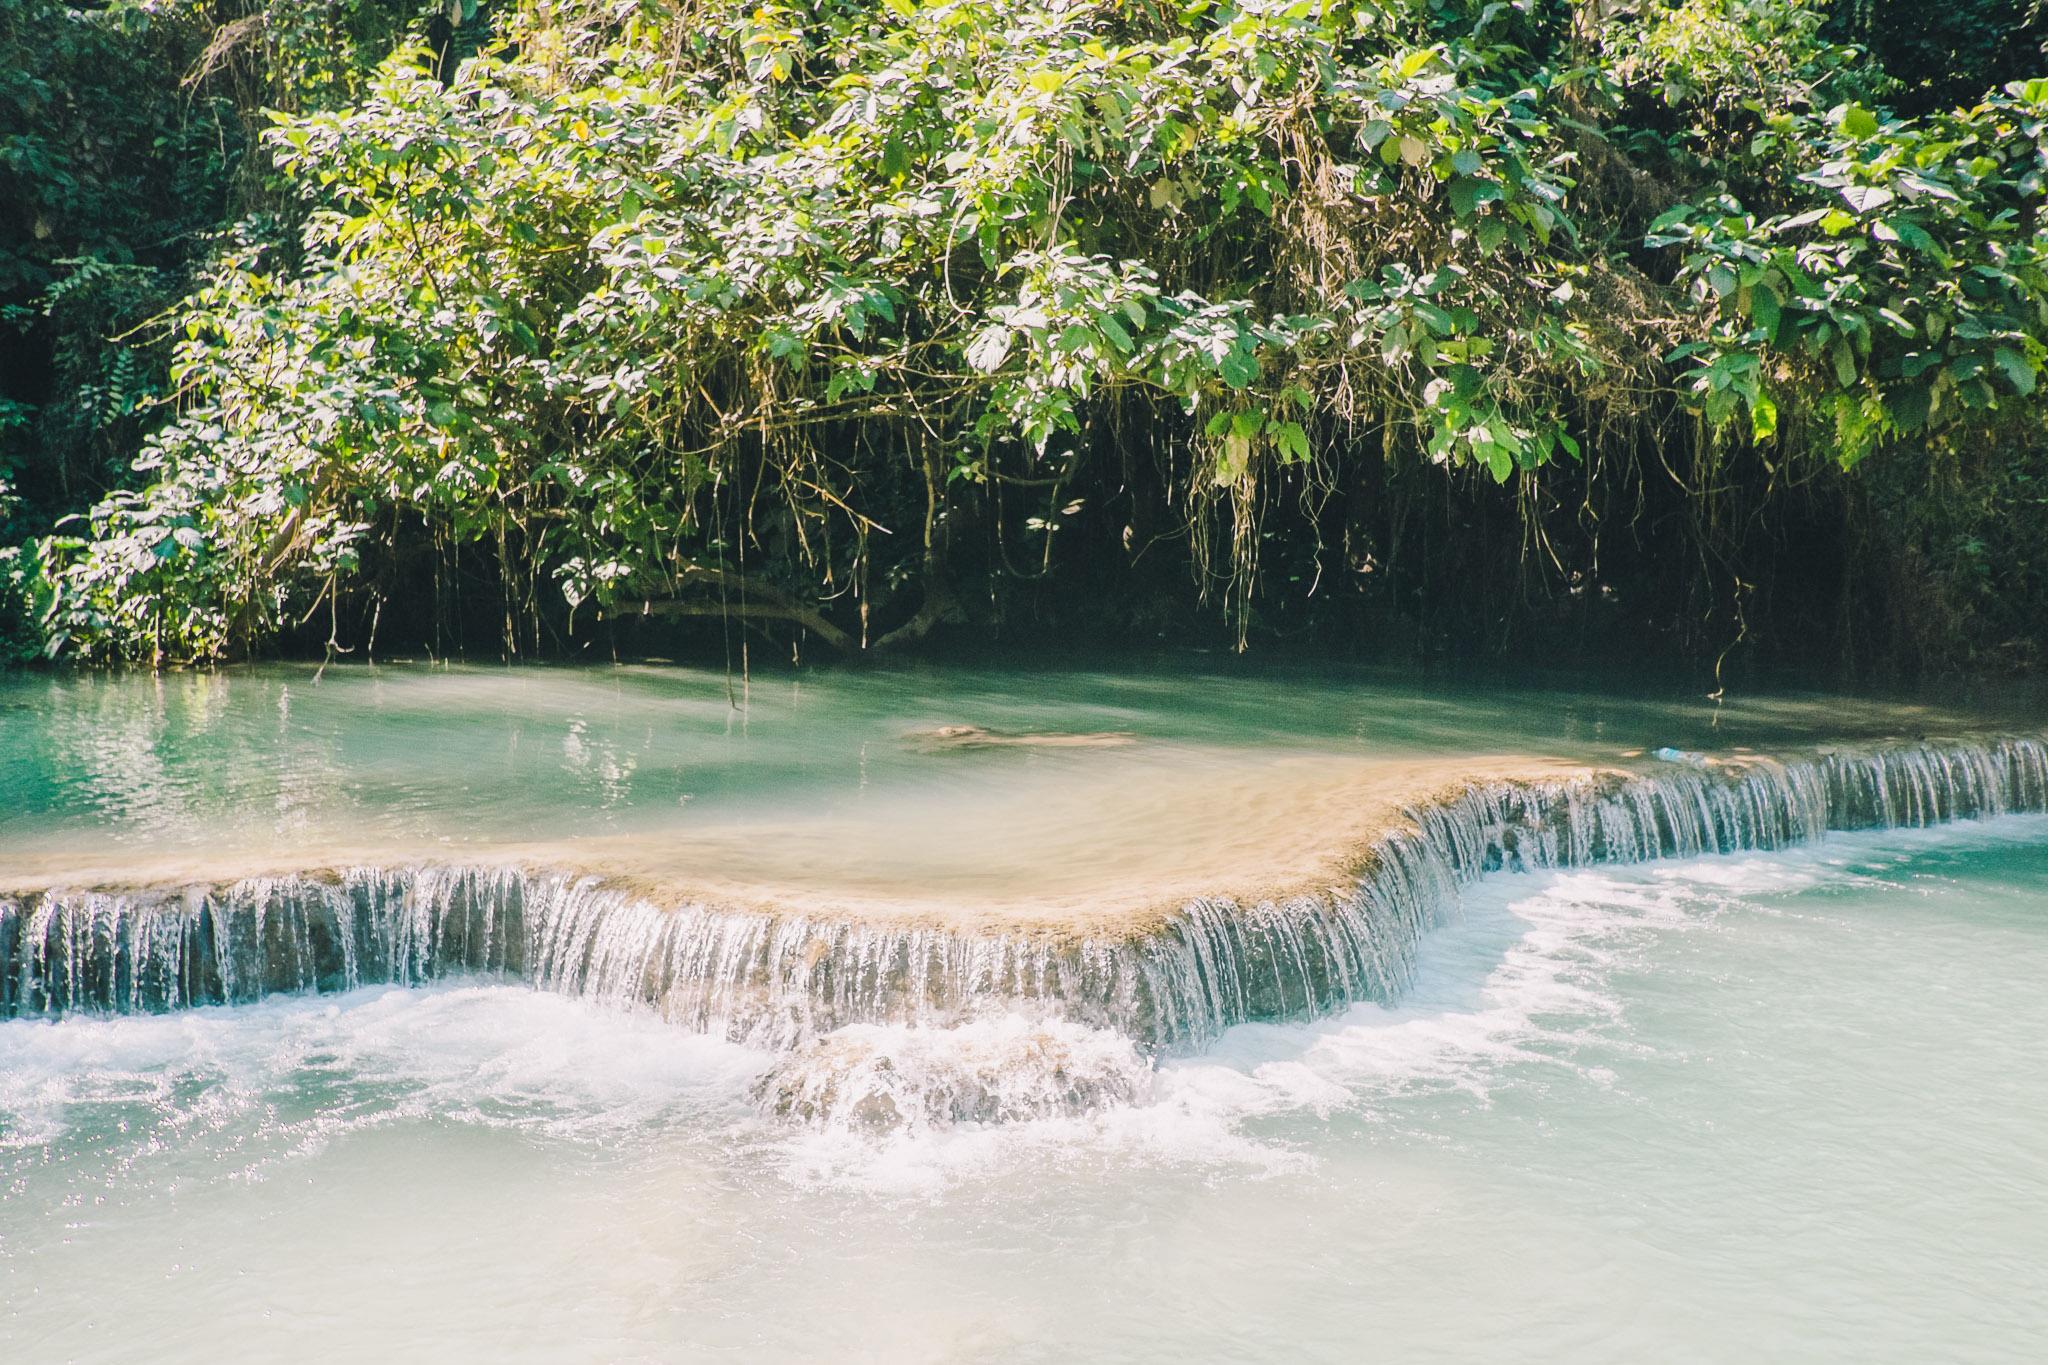 laos-luang-prabang-kuang-si-falls-3.jpg